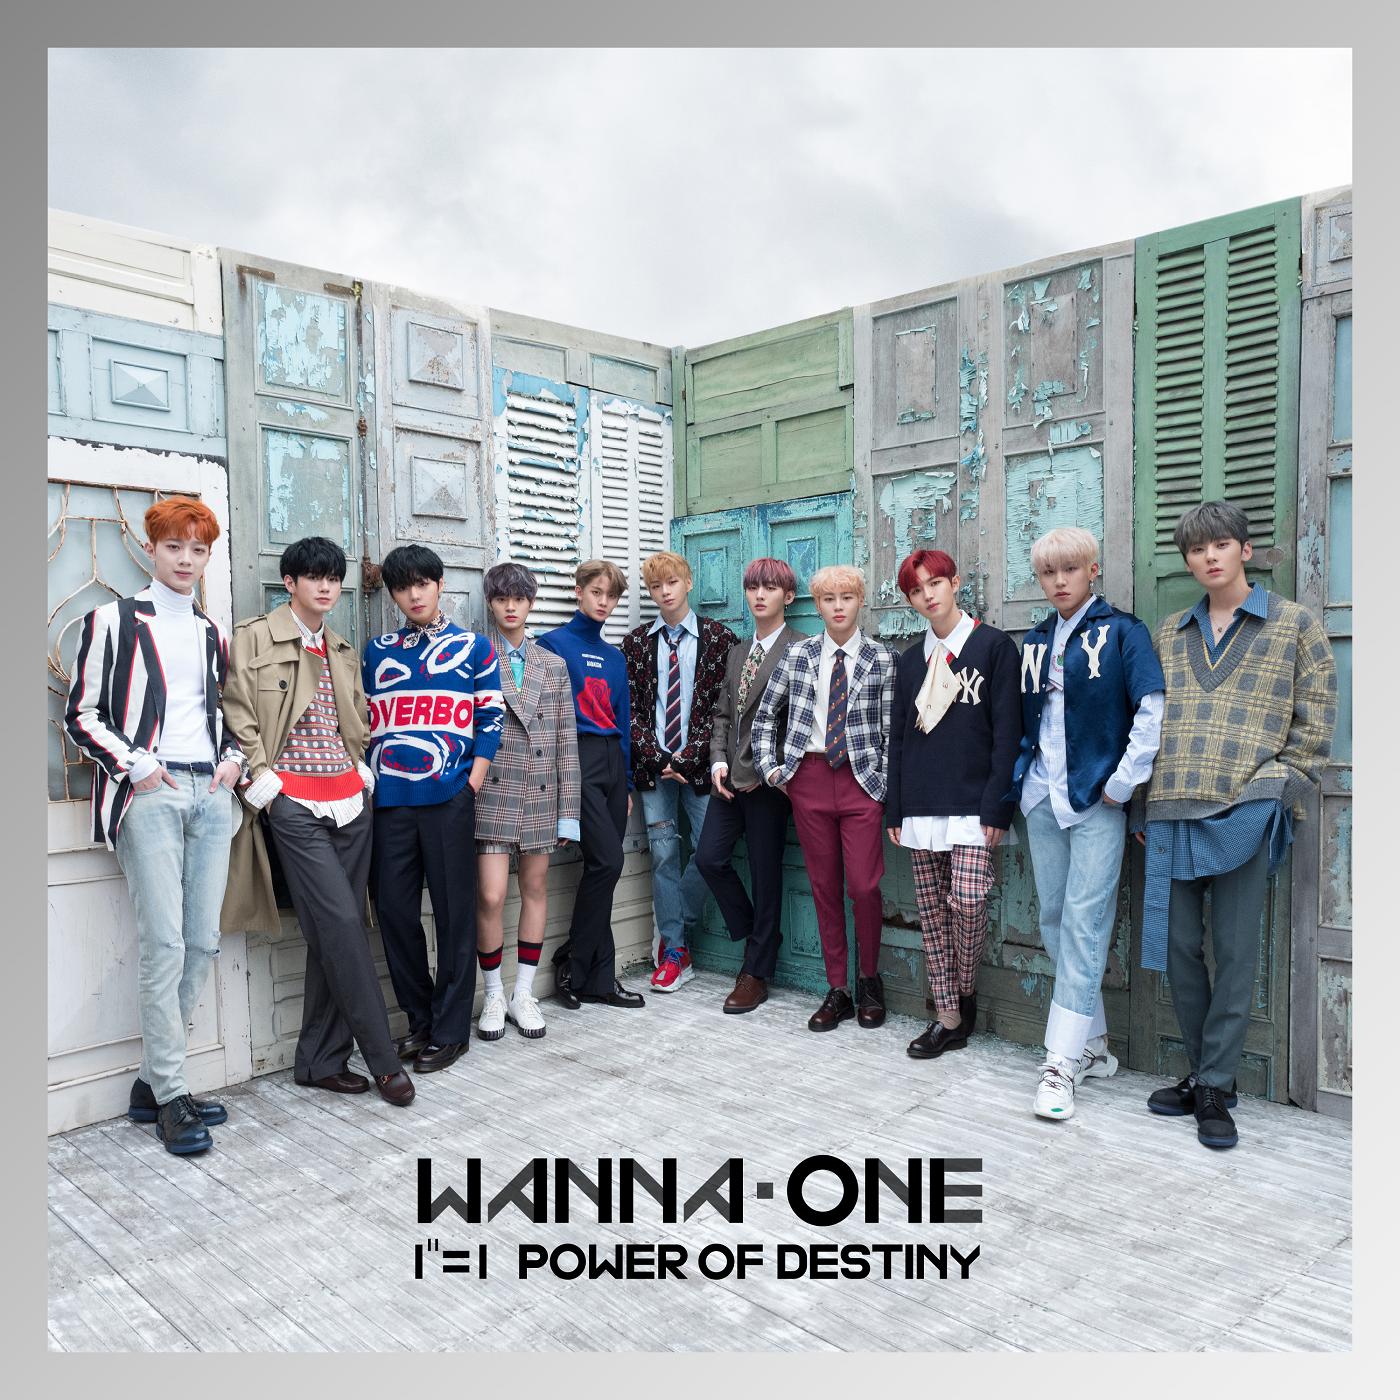 1¹¹=1 (Power of Destiny)